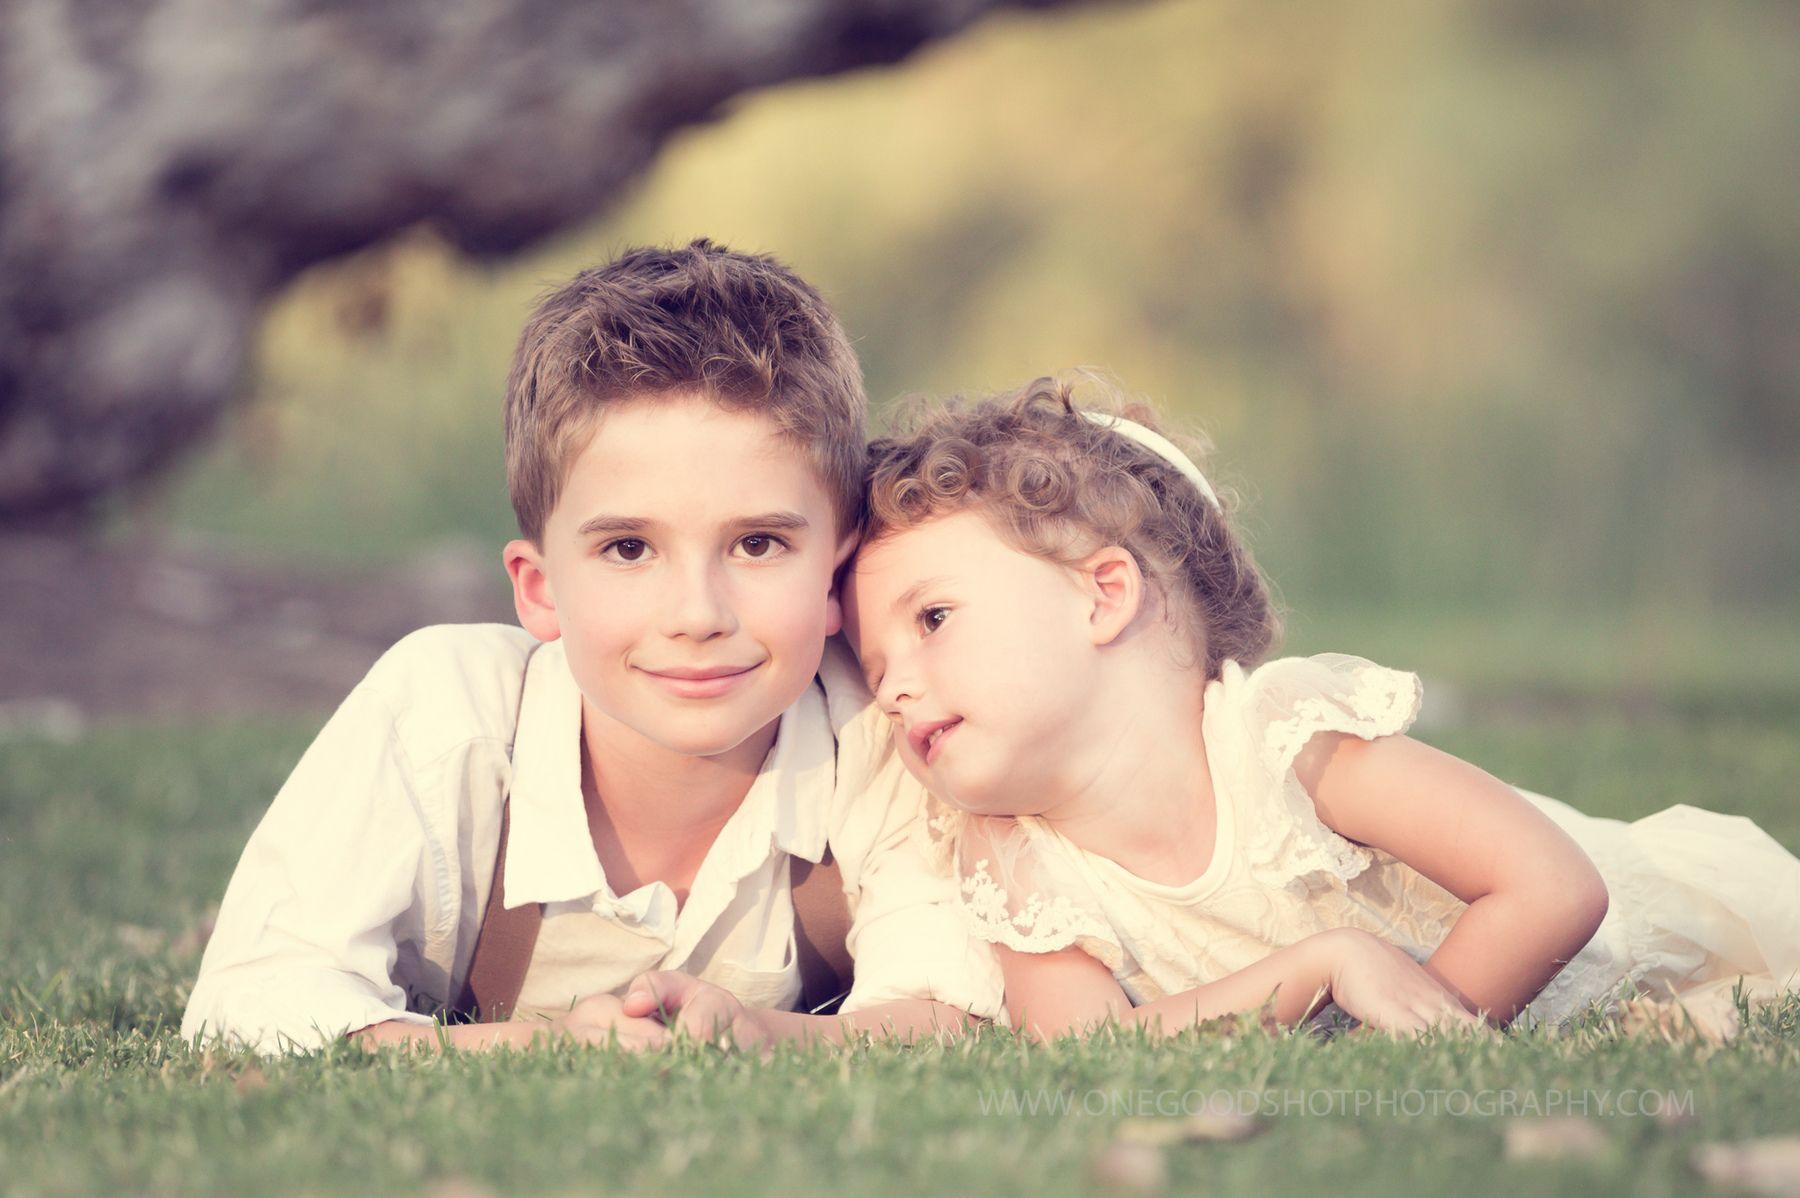 Картинка на тему брат и сестра